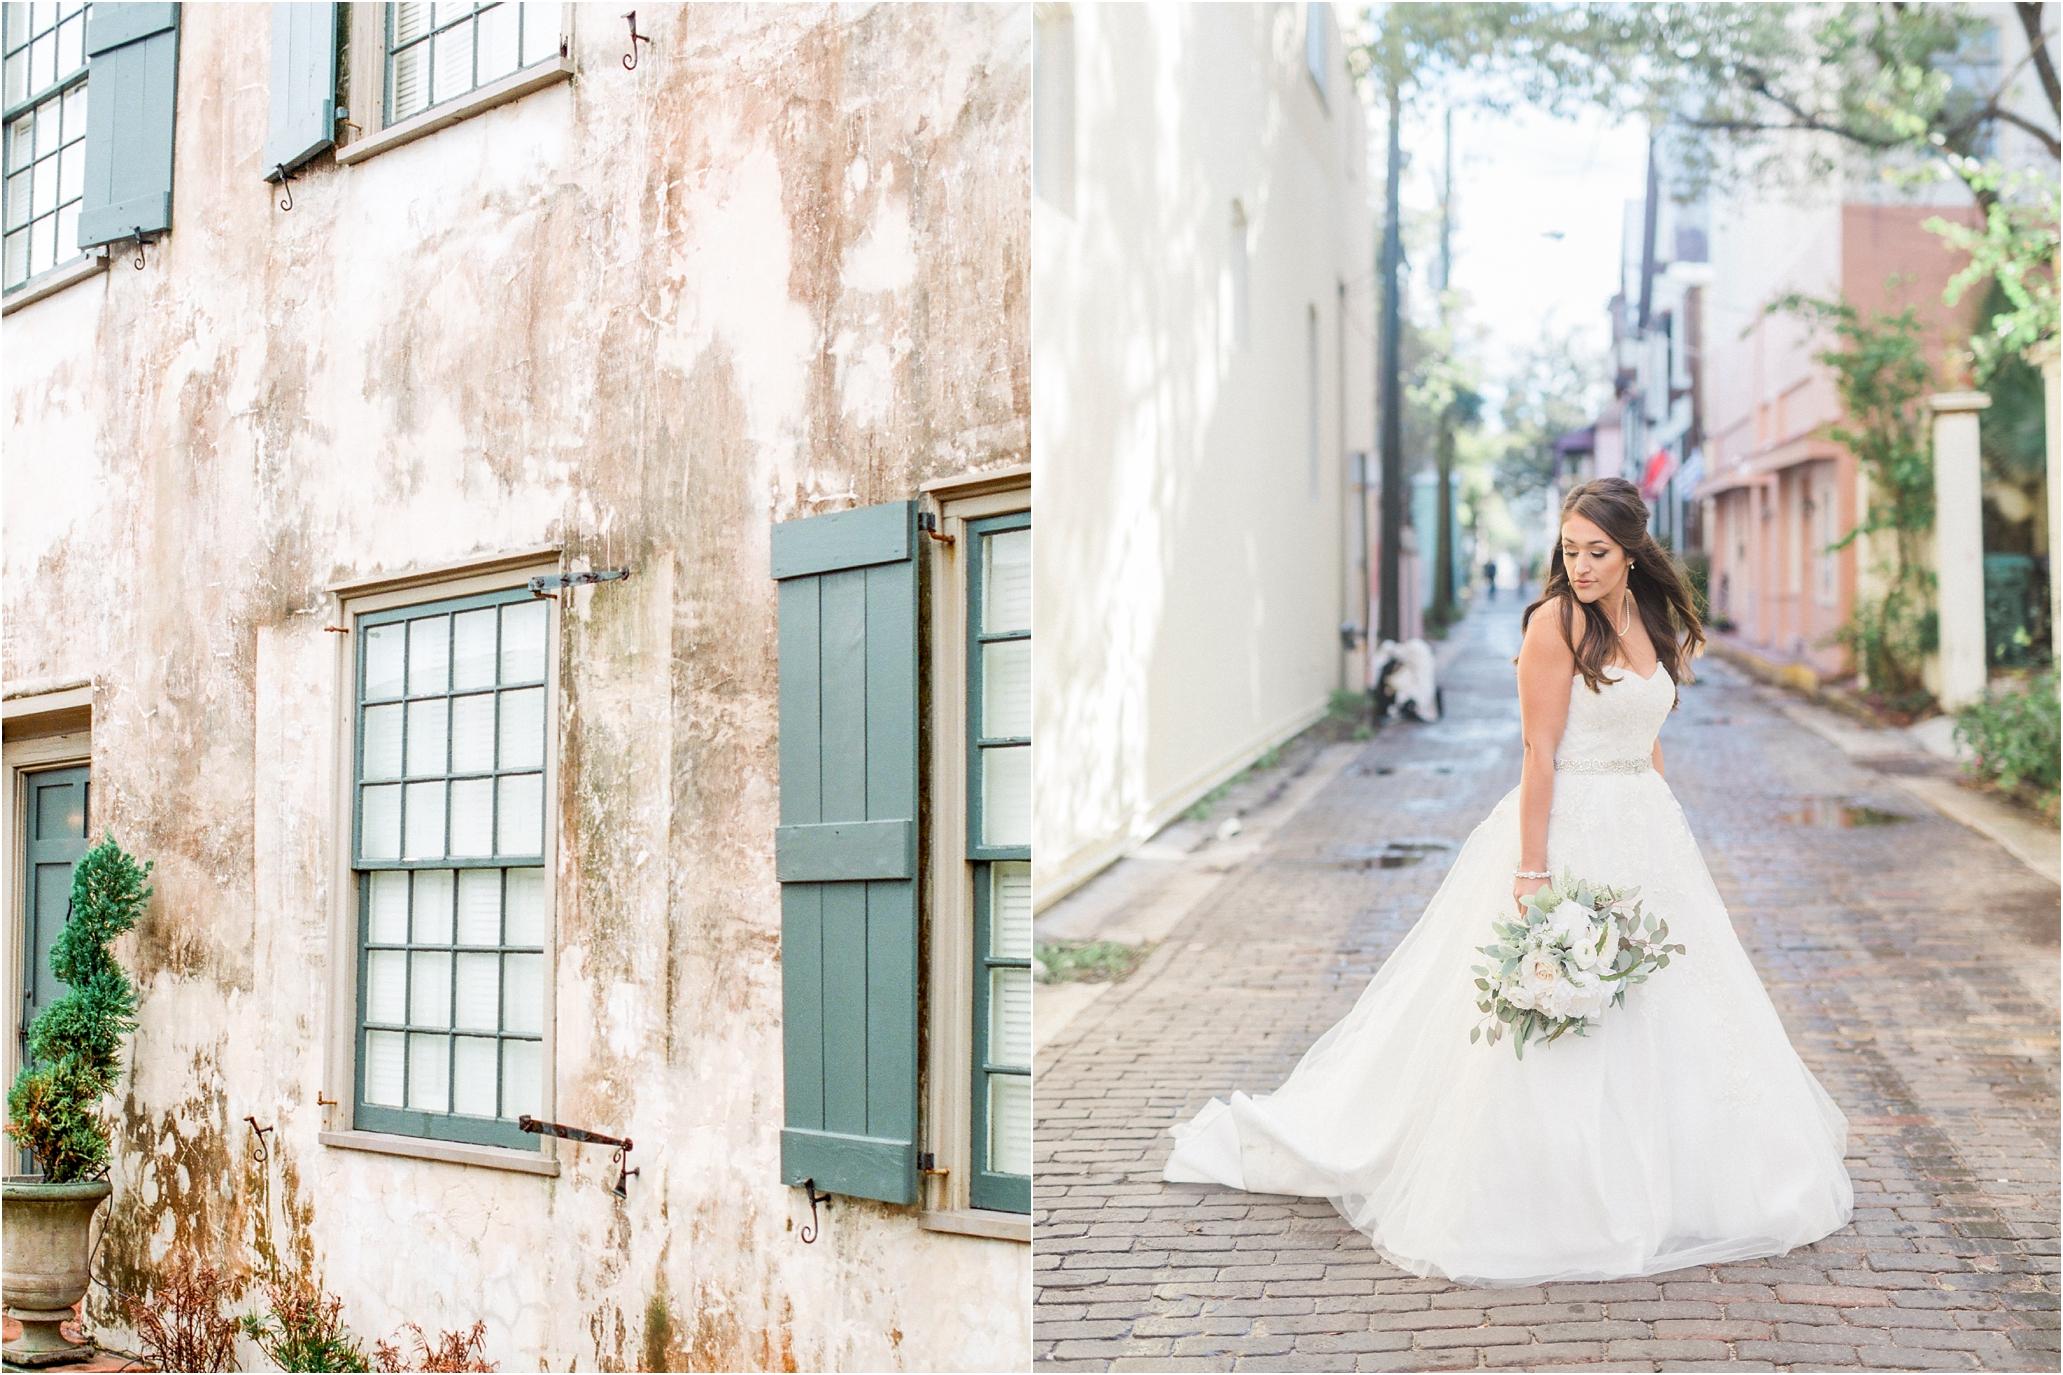 Lisa Silva Photography- Ponte Vedra Beach and Jacksonville, Florida Fine Art Film Wedding Photography- Wedding at The White Room Villa Blanca in St. Augustine, Florida_0014.jpg